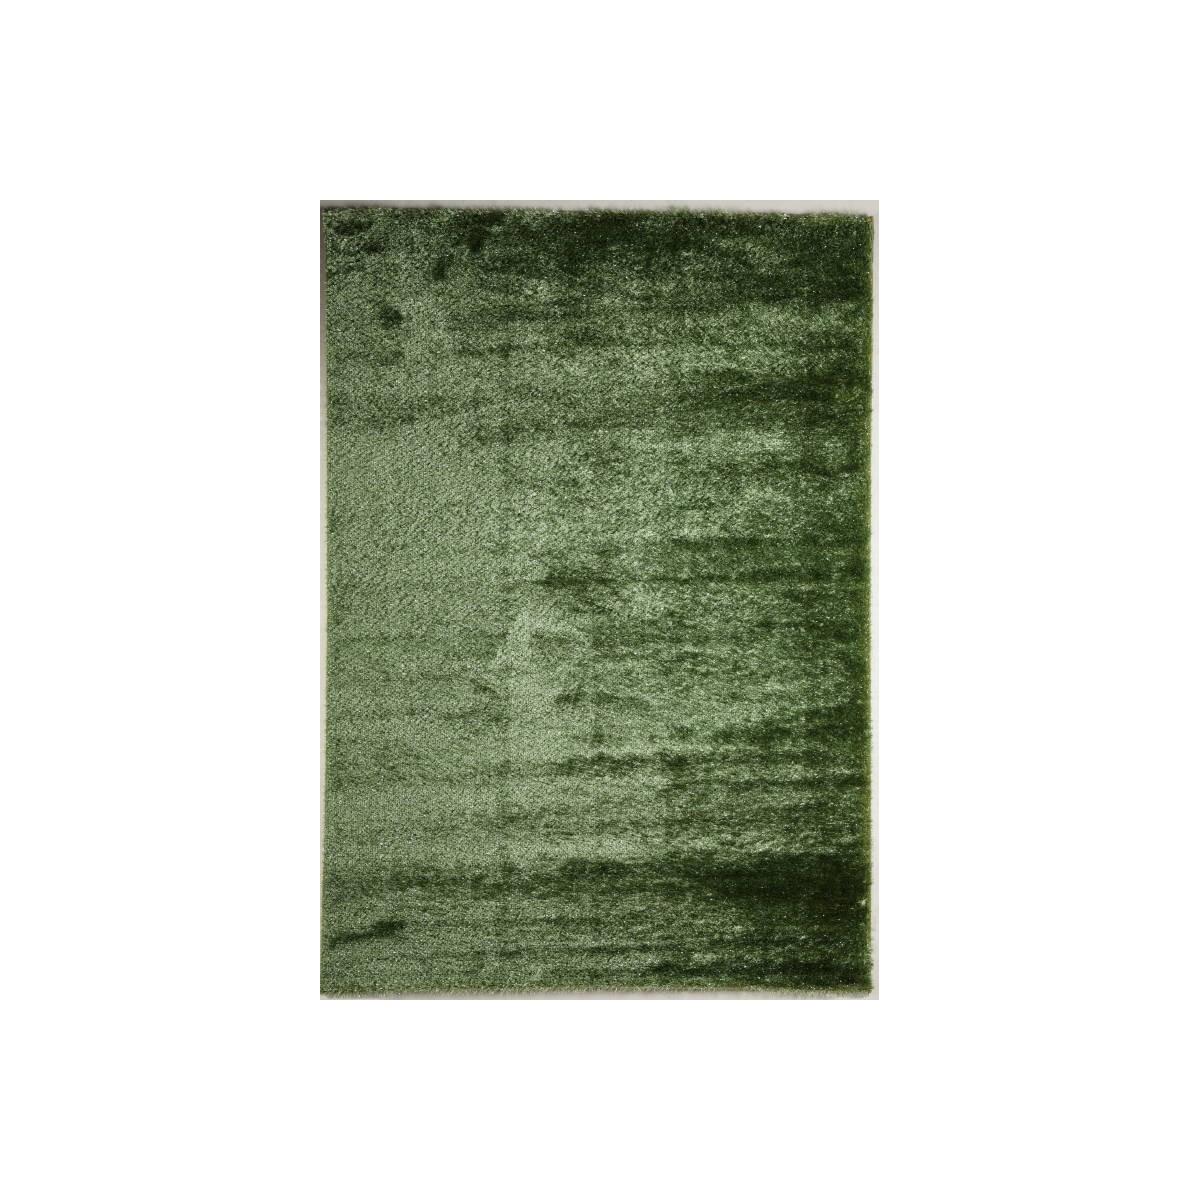 tapis shaggy de salon brillant et elegant 80x150 cm shaggy moonlight vert amp story 5267